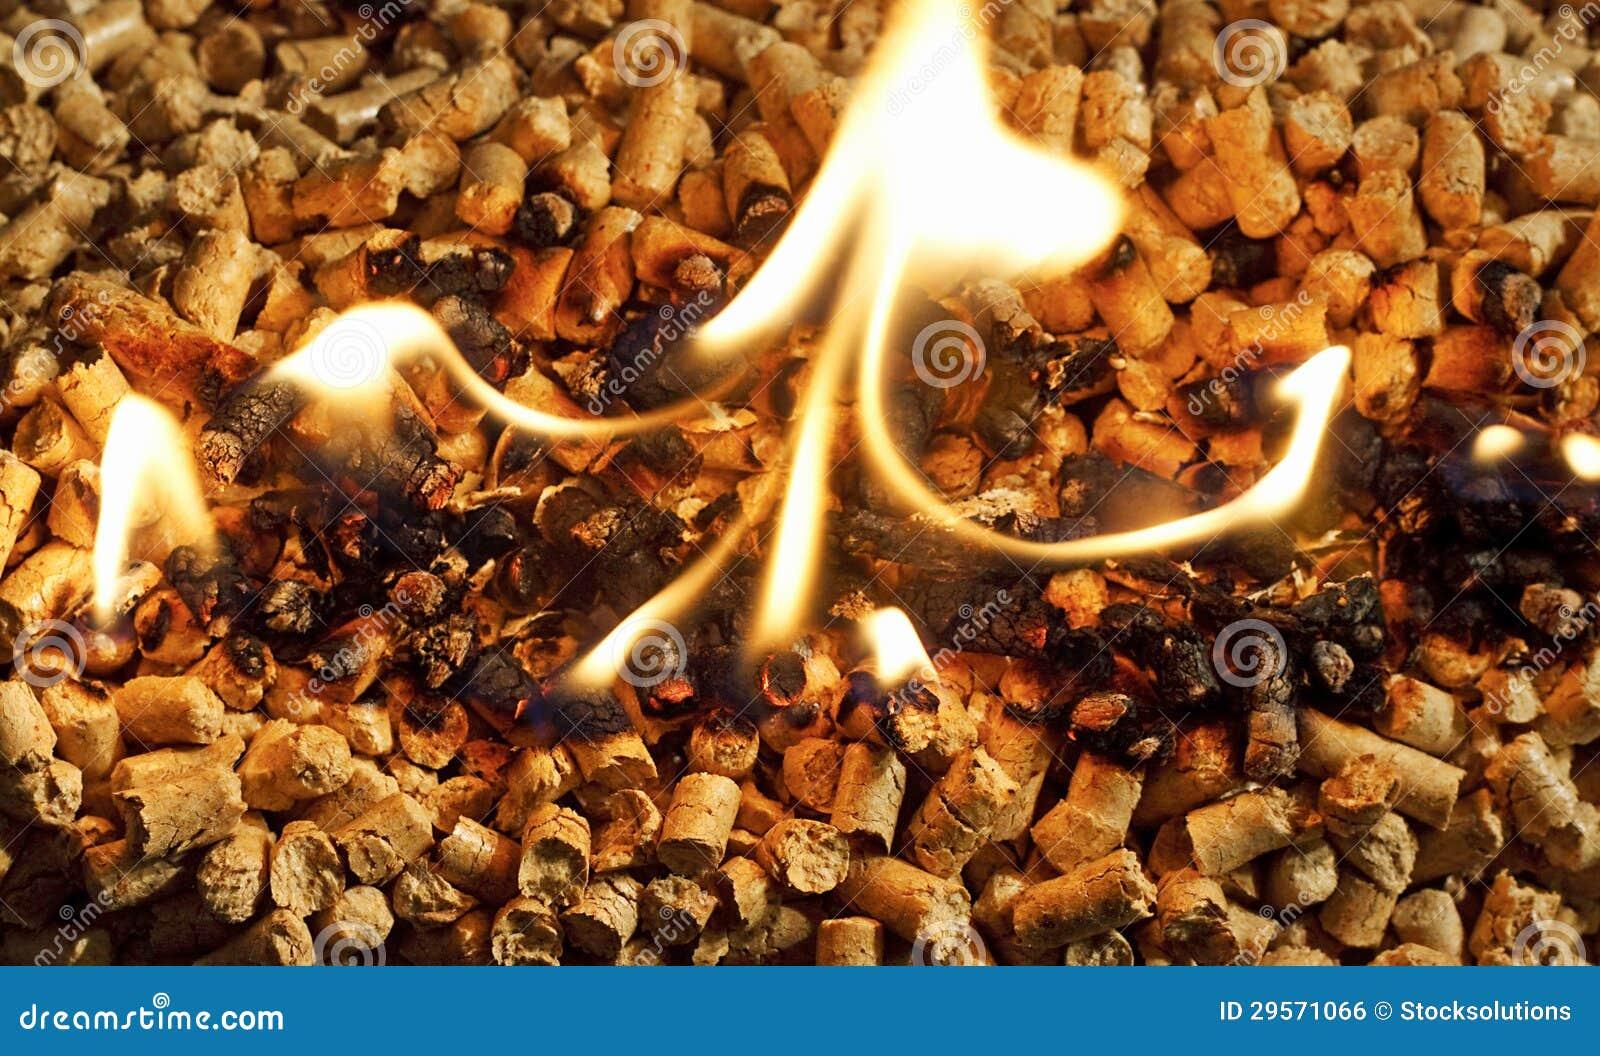 Burning wood chip biomass fuel a renewable alternative